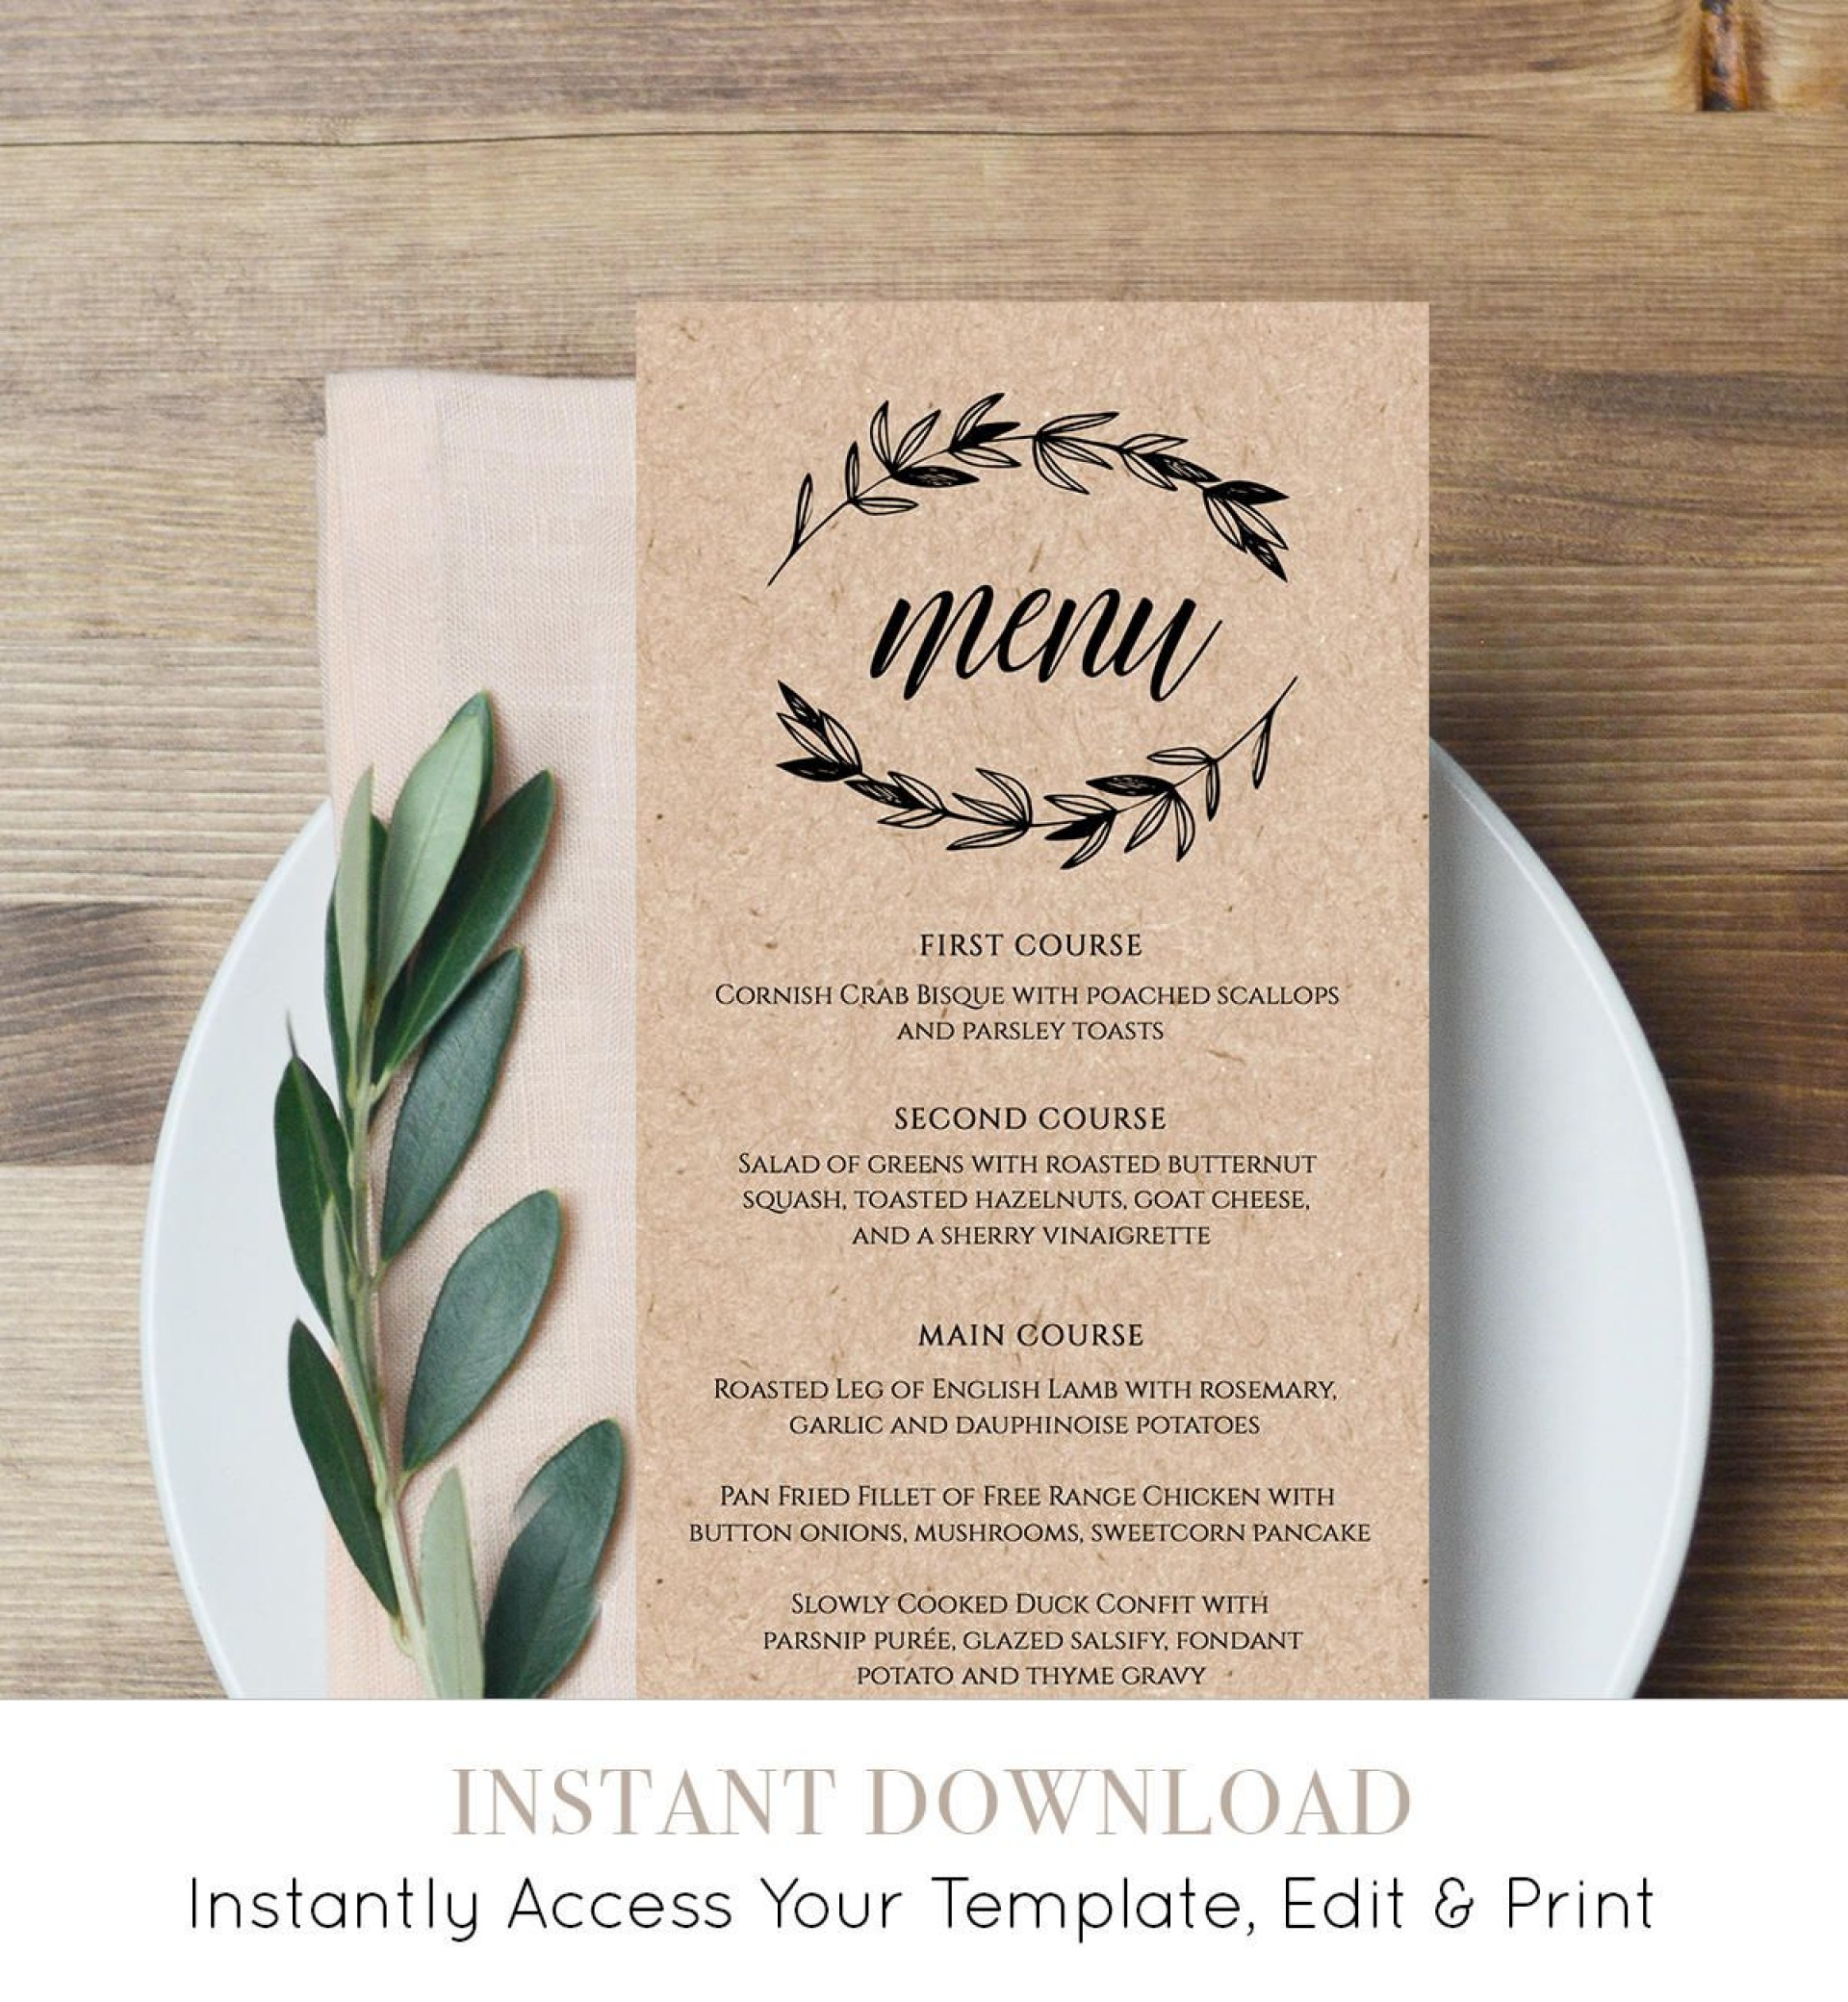 006 Unusual Free Printable Wedding Menu Card Template Design  Templates1920